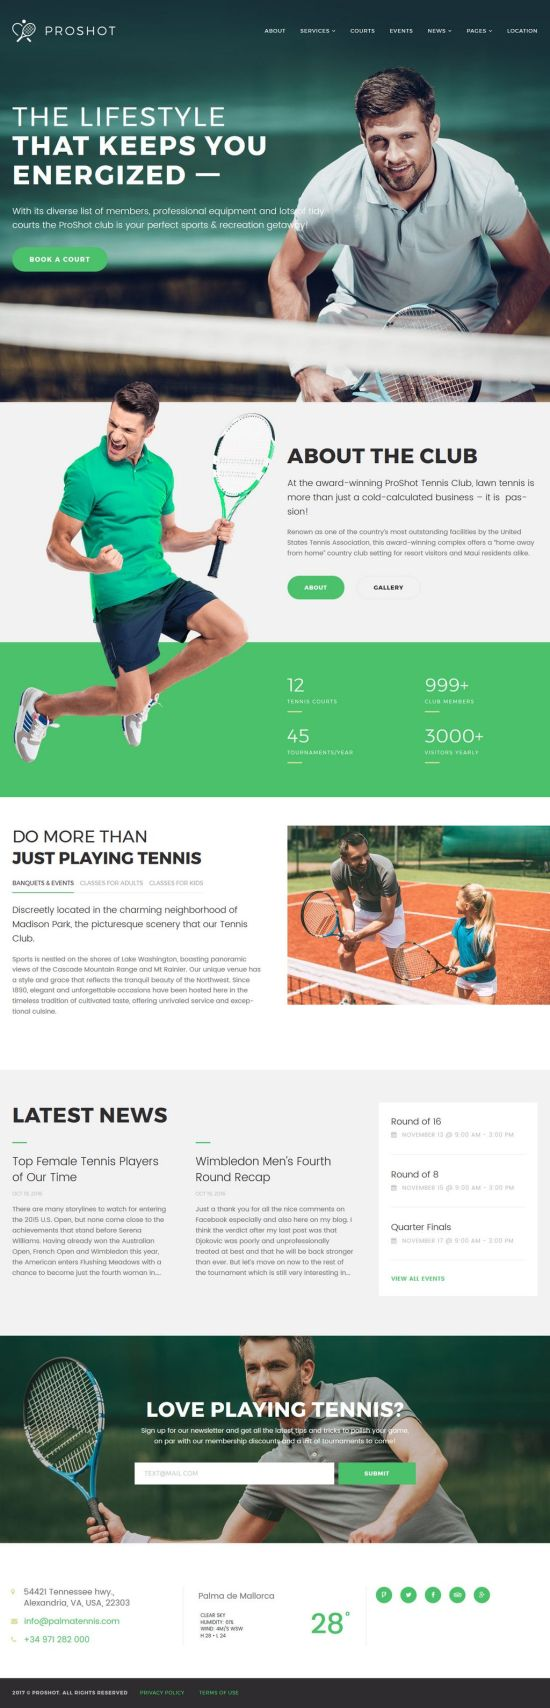 proshot wordpress theme sports theme 01 - ProShot WordPress Theme